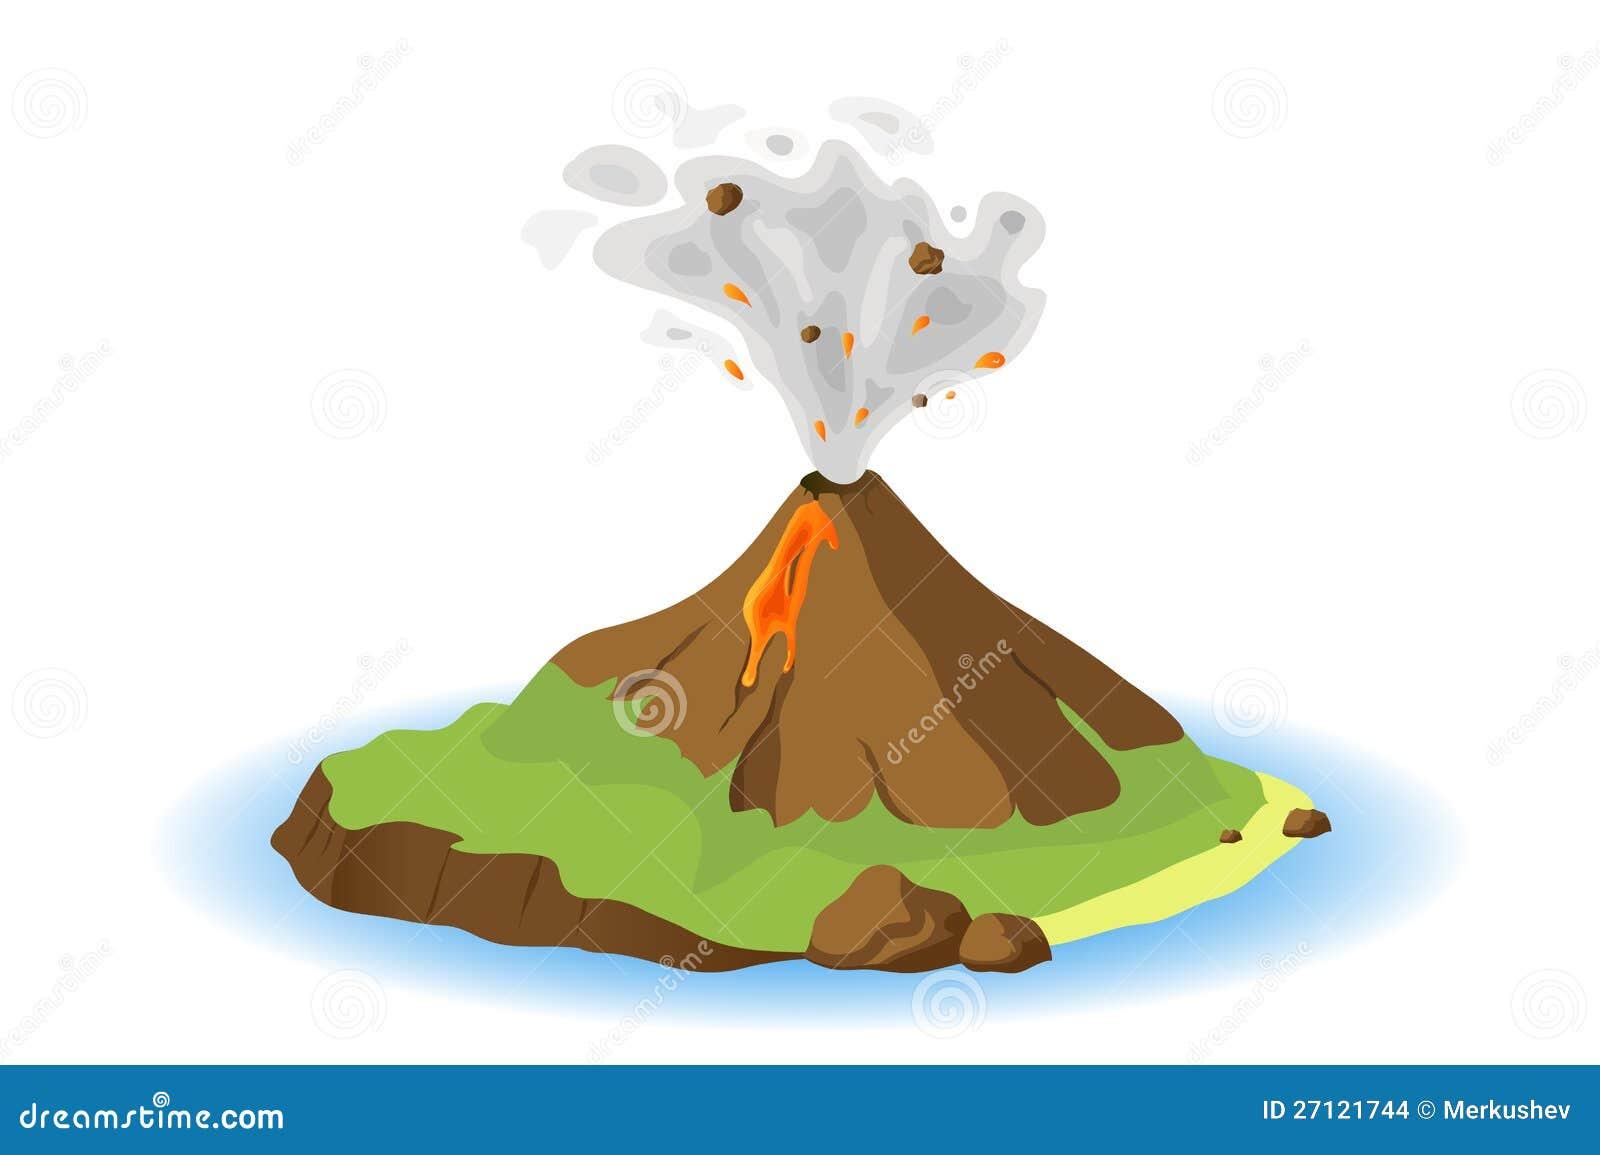 V Is For Volcano Clipart Volcano Eruption Clipart